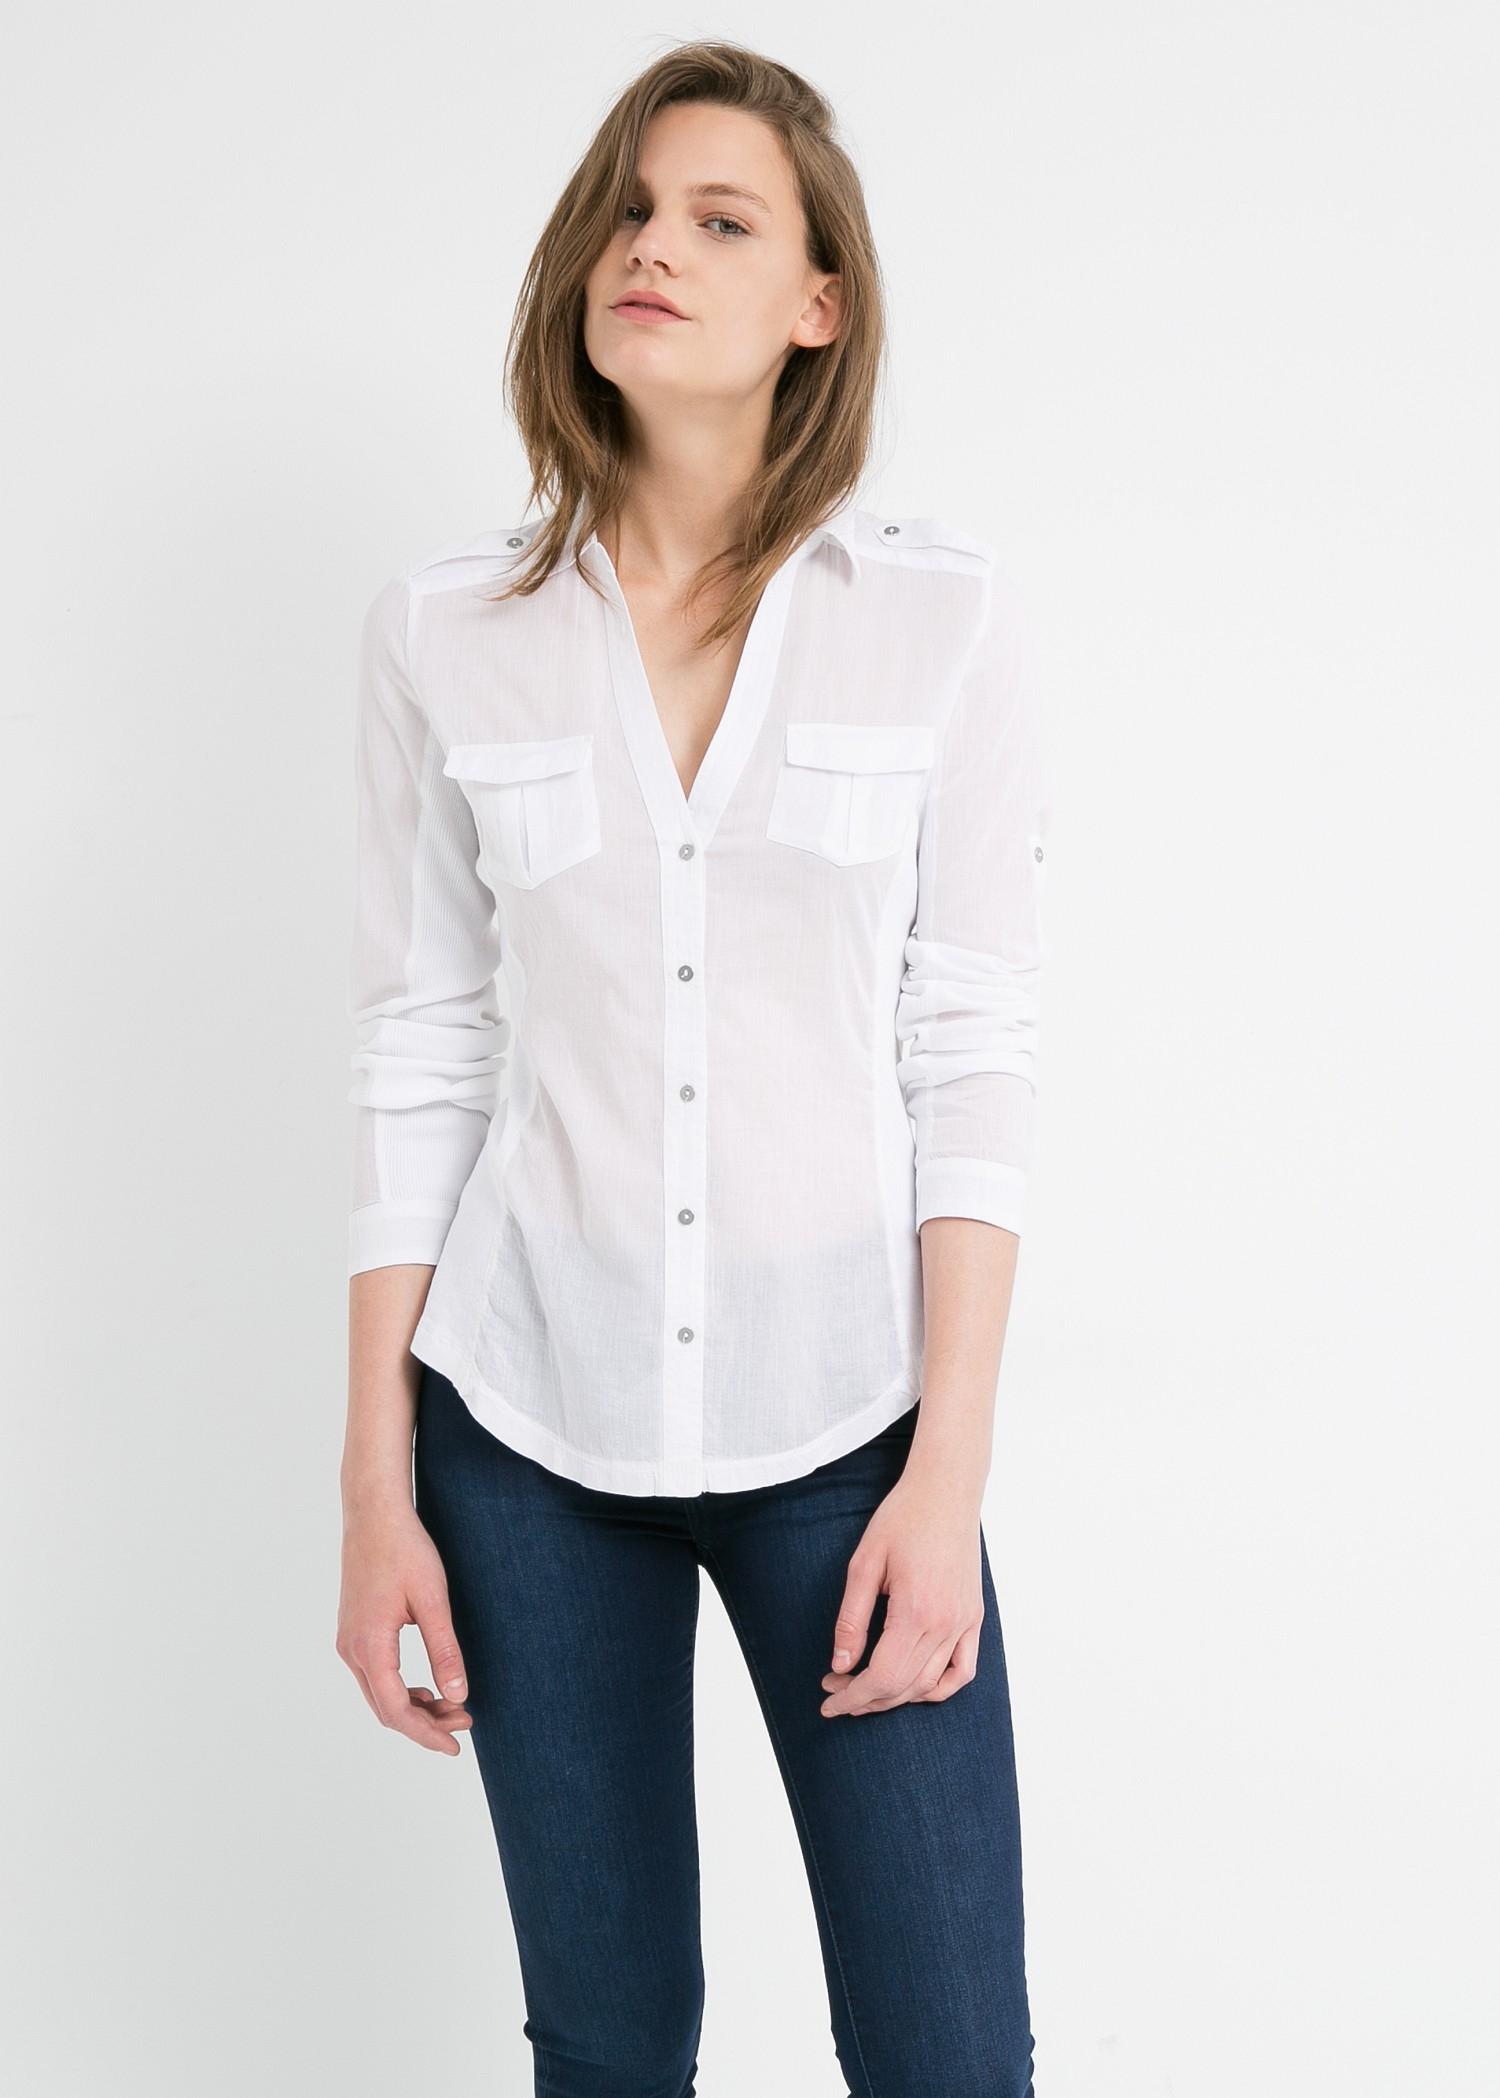 54b7a885 Mango White Chest-Pocket Cotton Shirt